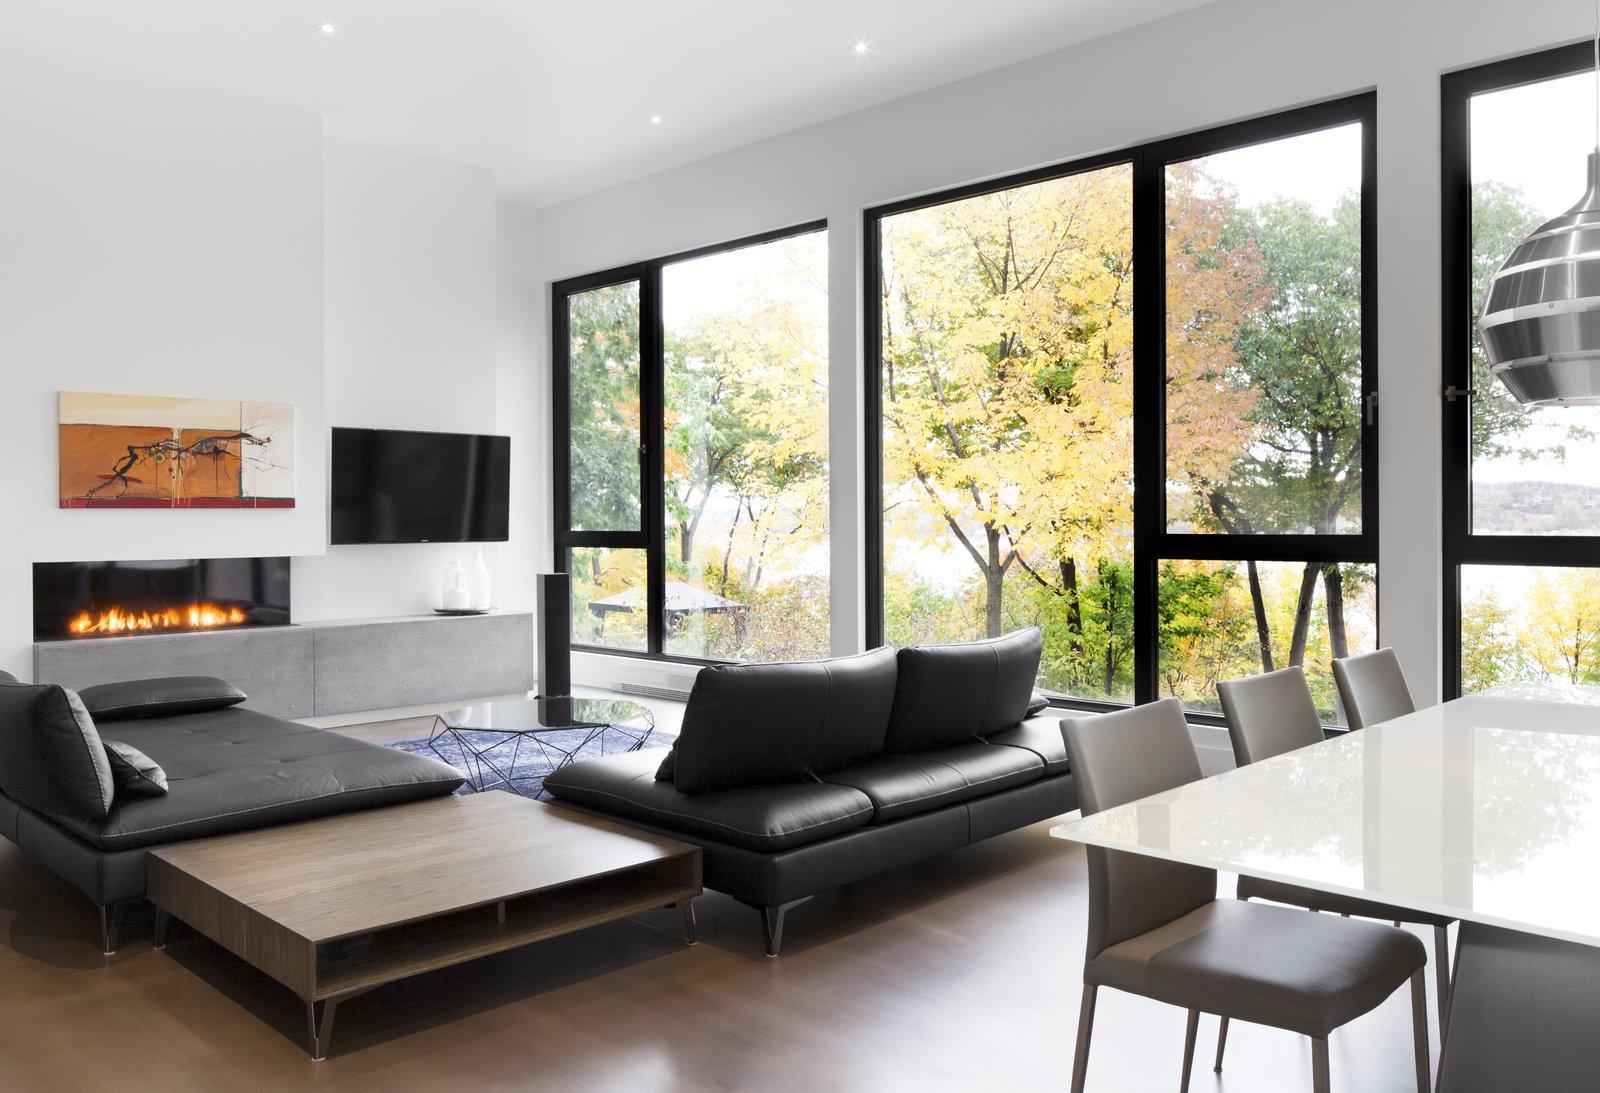 Living room at Rue de l'Anse residence - PARKA Architecture & Design - Quebec city, Canada  Rue de l'Anse residence by PARKA - Architecture & Design